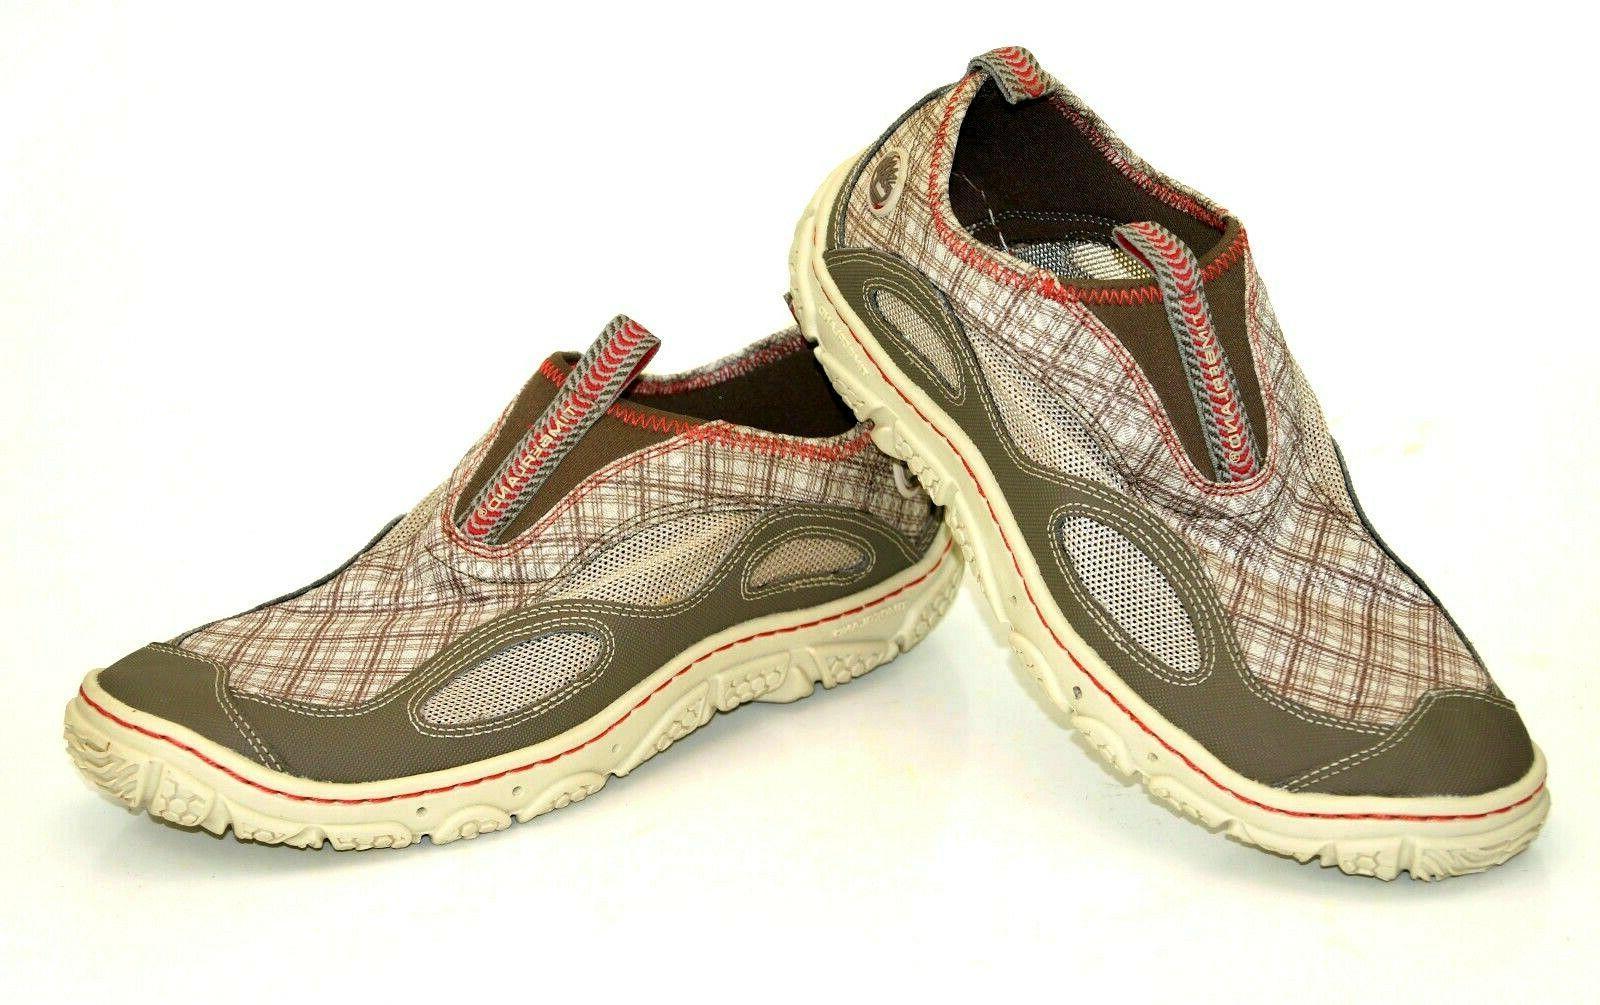 Pool Ocean Shoes Trainers Wake 30175